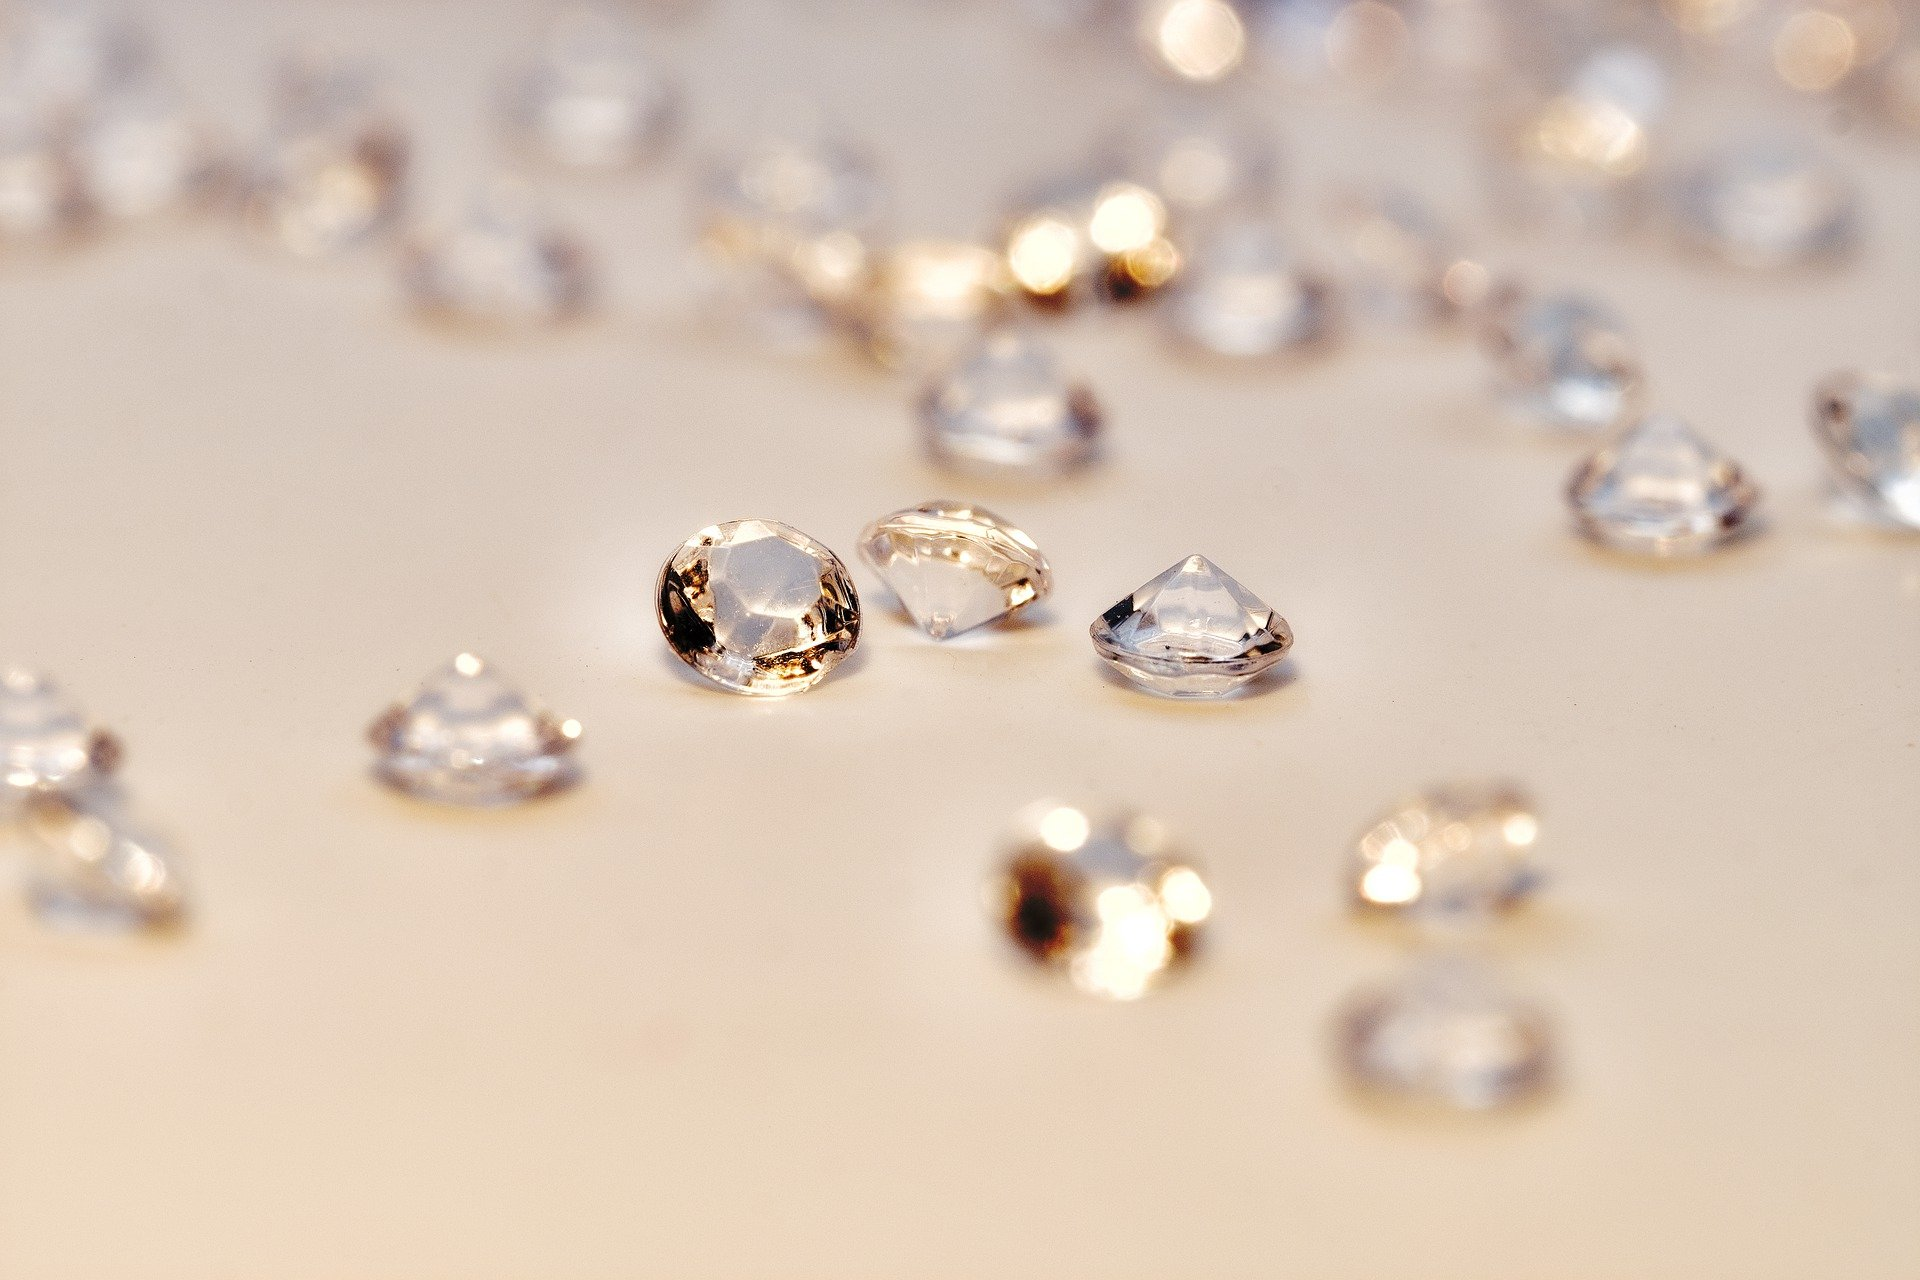 How Big Are The Diamonds?